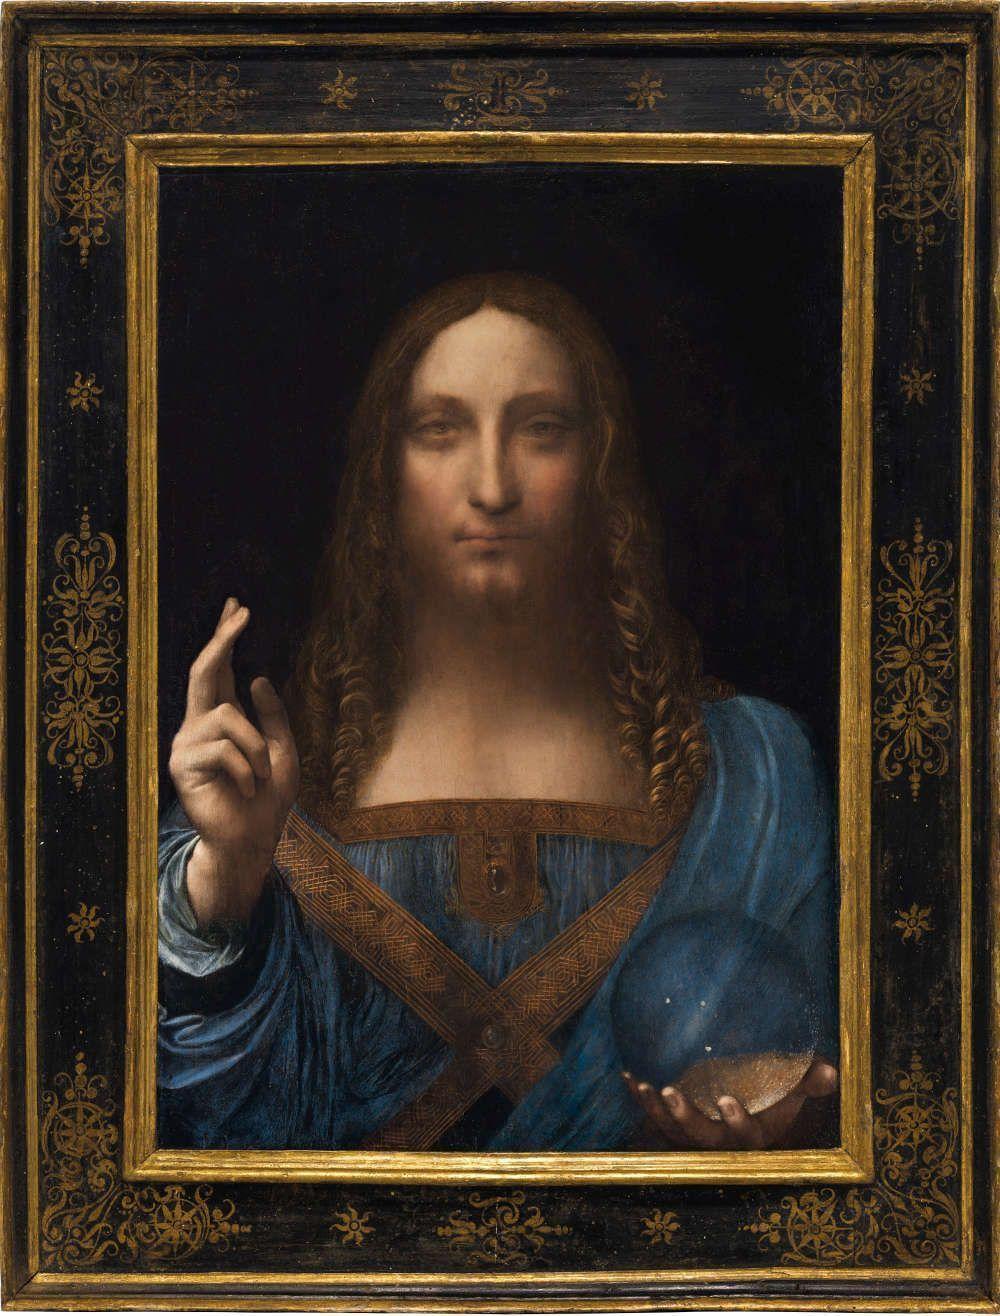 Leonardo da Vinci, Salvator Mundi (mit Rahmen), Öl/Walnuss, 65.7 x 45.7 cm, um 1500 (Privatsammlung, courtesy Sothenby's)